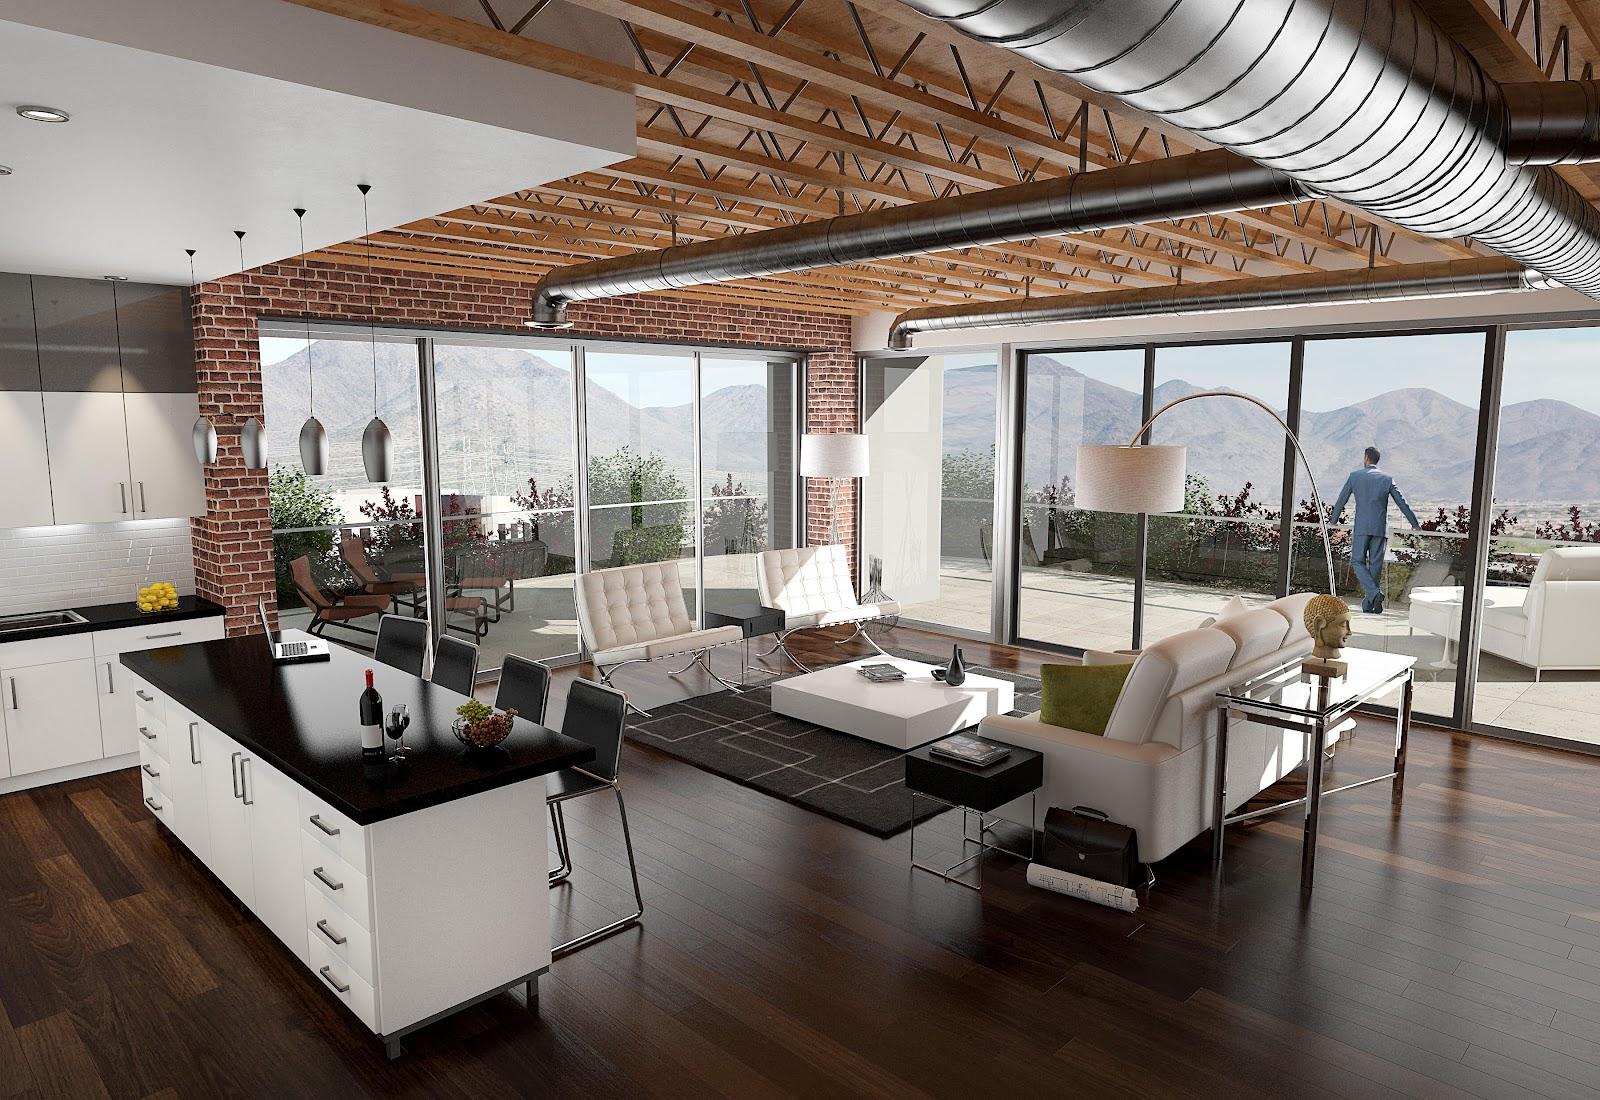 Irene Catsibris Clary on SOHO Scottsdale's Latest Luxury Townhomes, Penthouses & Lofts02